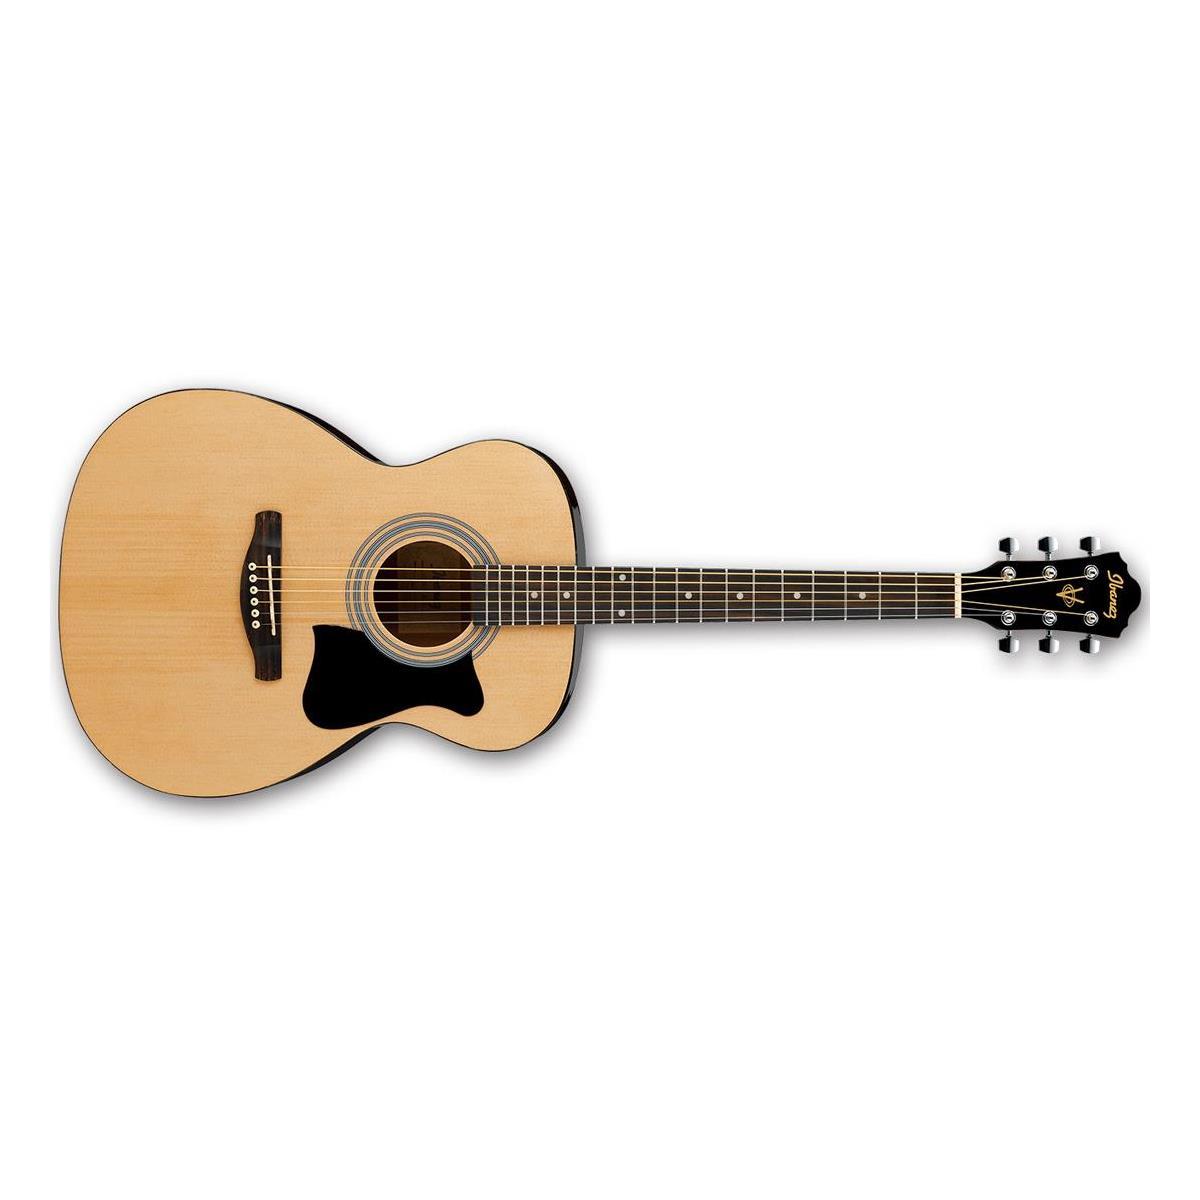 Ibanez Jampack IJVC50 Grand Concert Acoustic Guitar or Ibanez Jampack IJV50 Dreadnought Acoustic Guitar + Bag $99 + free shipping